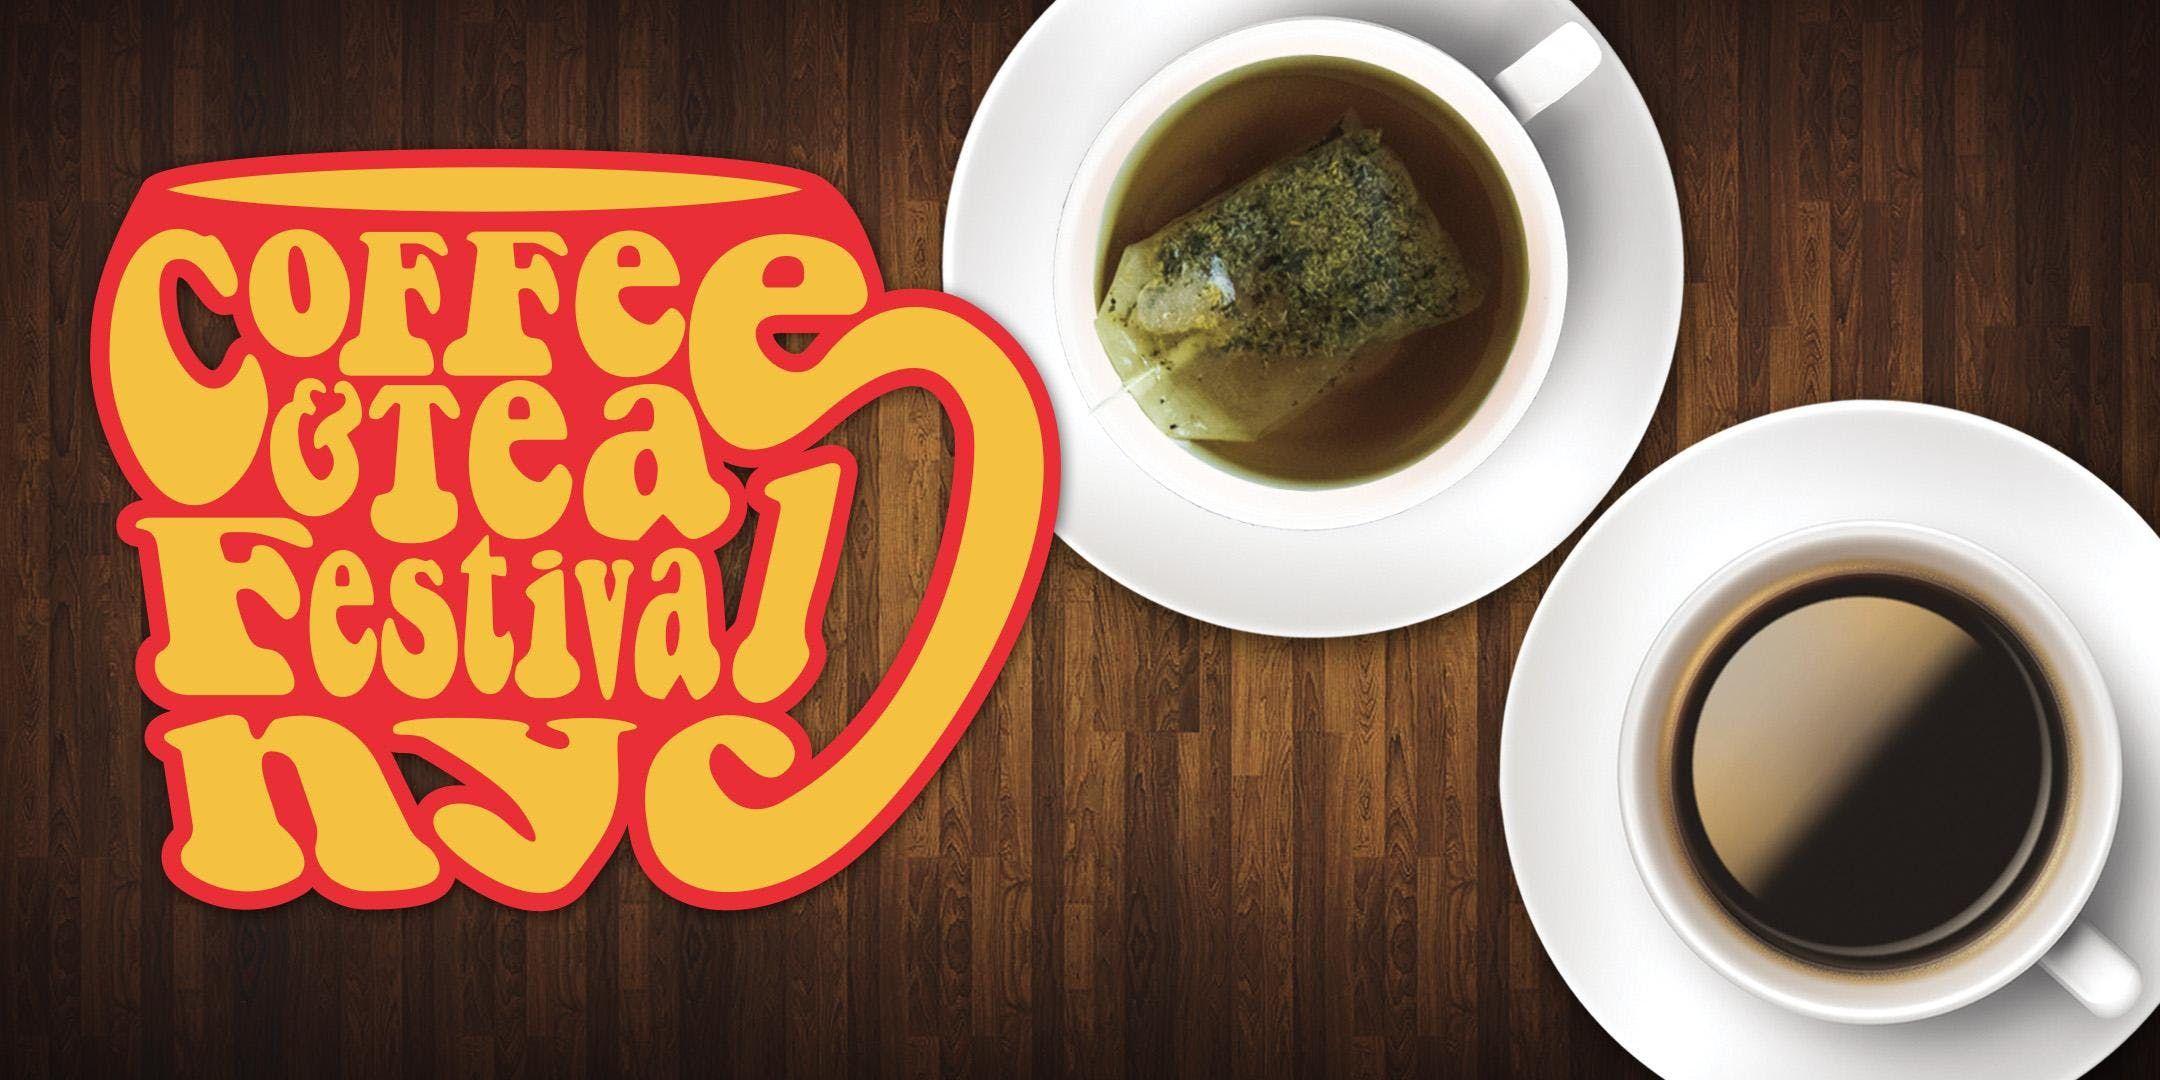 Coffee & Tea Festival NYC - Saturday Rush